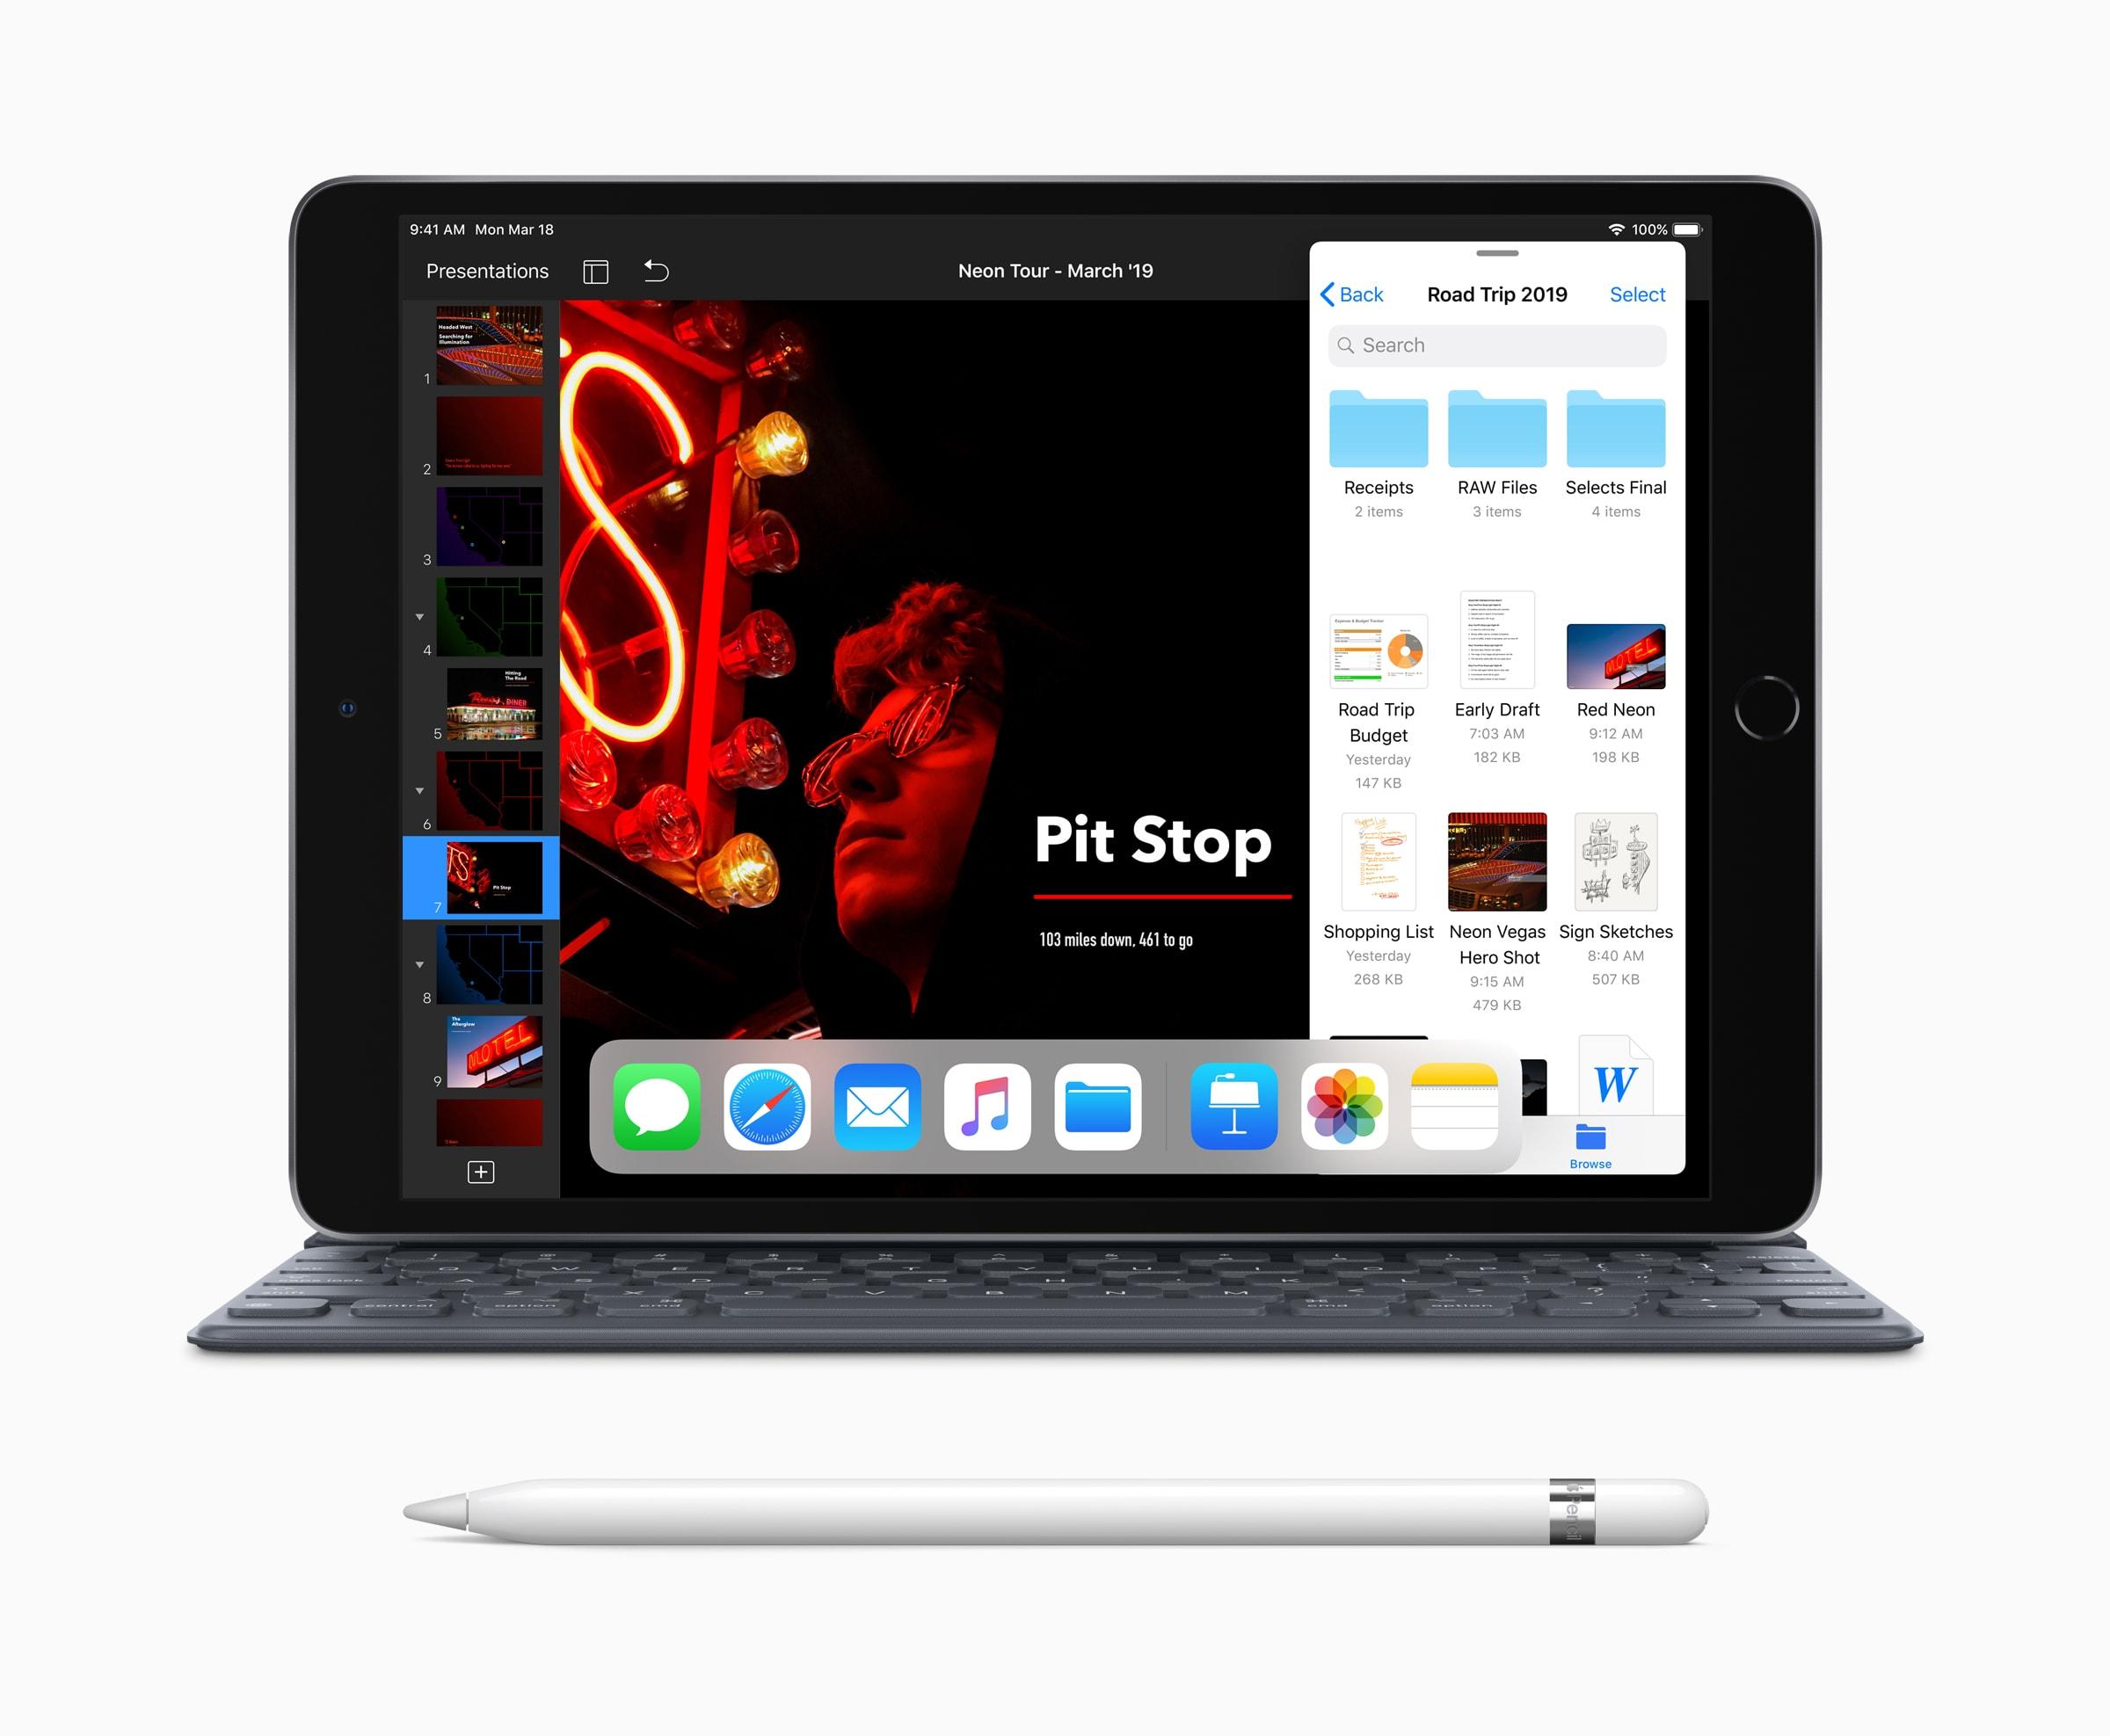 Novo iPad Air com Apple Pencil e Smart Keyboard